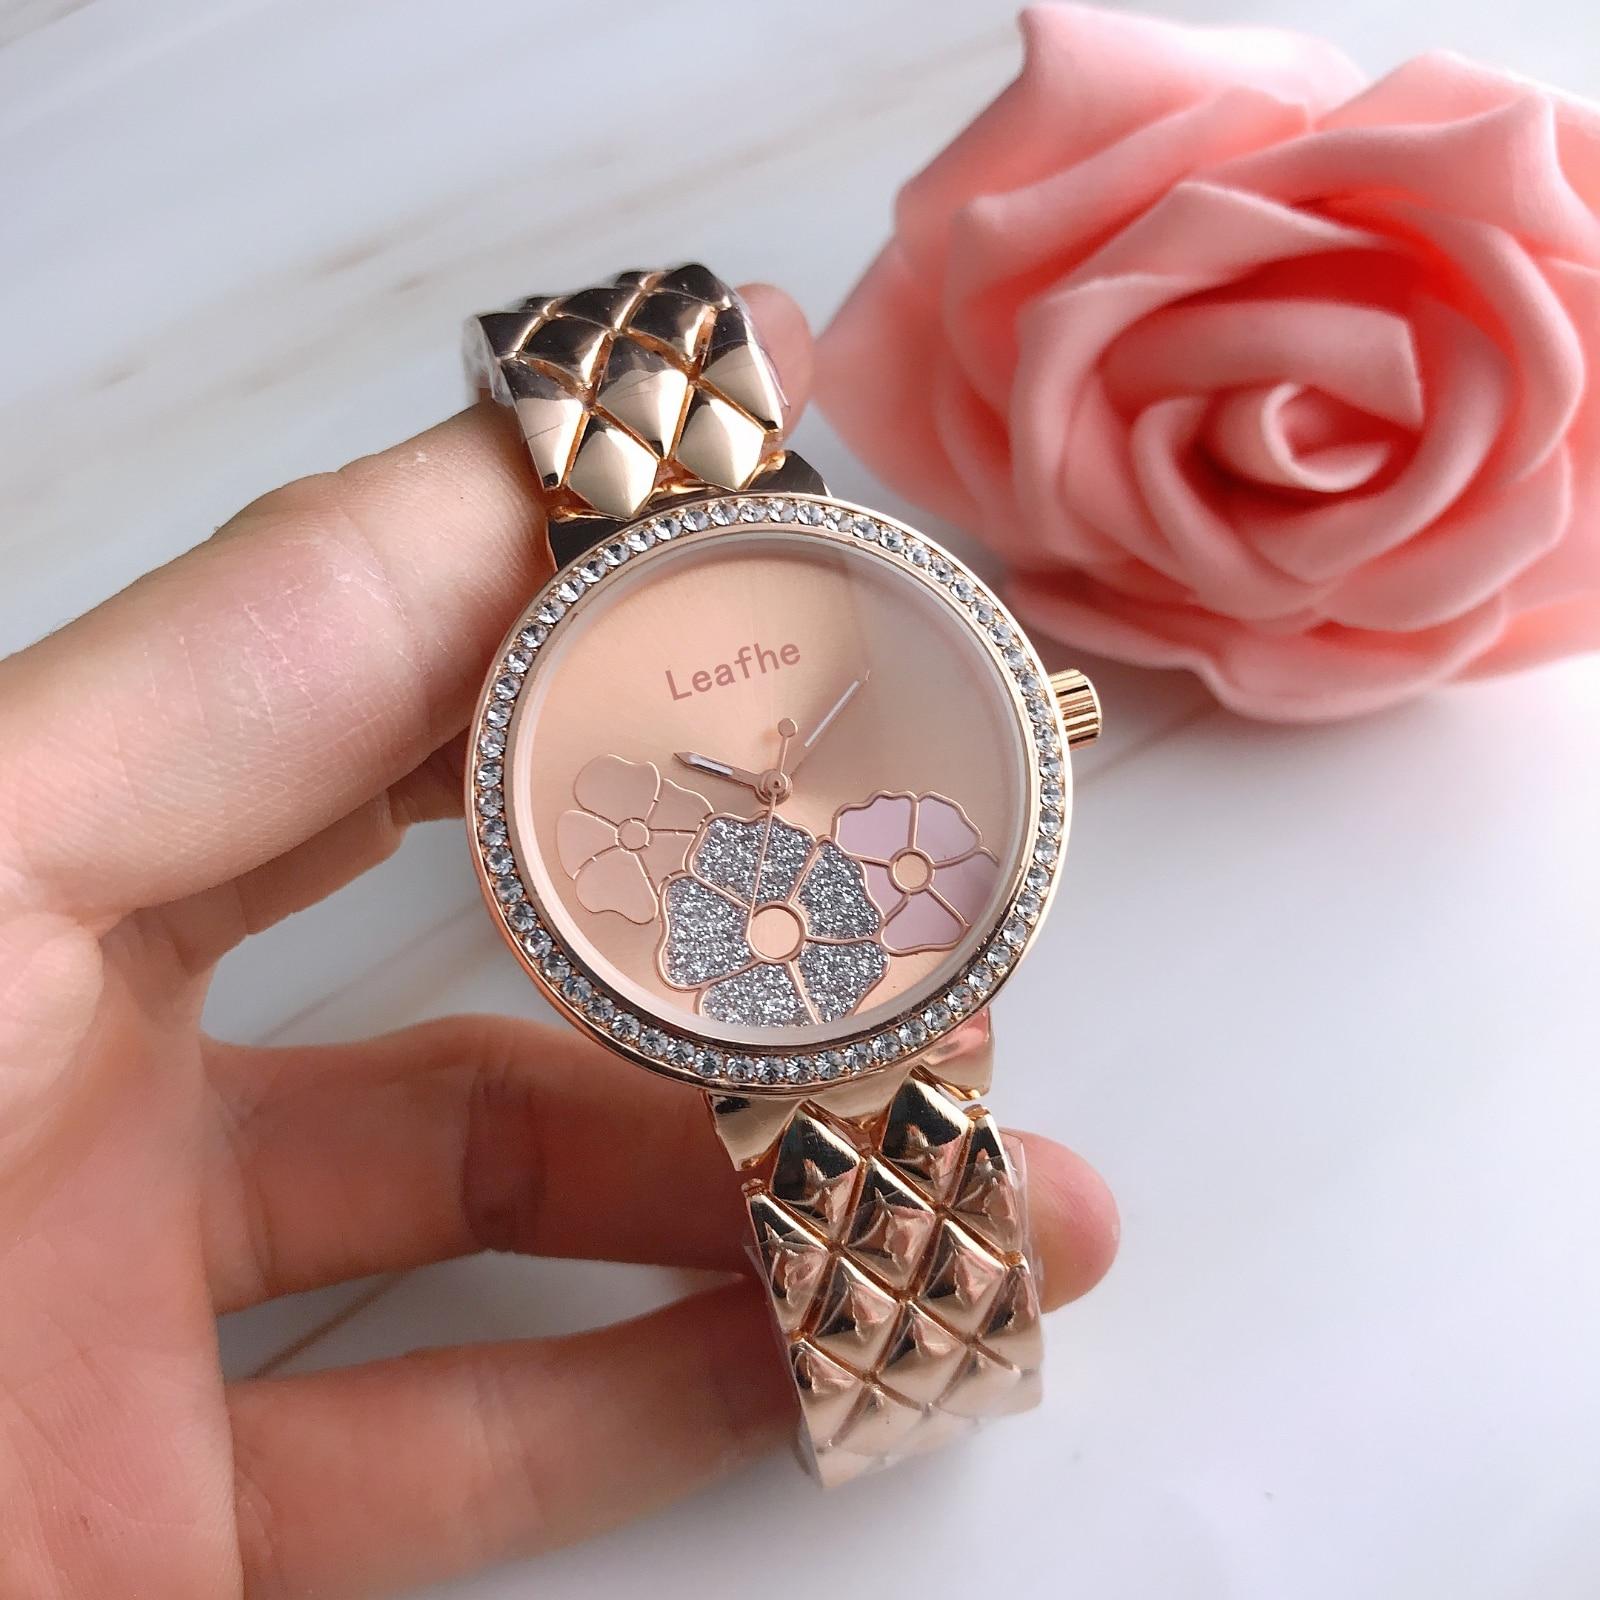 Fashion Brand Ladies Watches Silver Gold Rose Stainless Steel Flower Watch Women Quartz Watch Female Clock Reloj Mujer enlarge